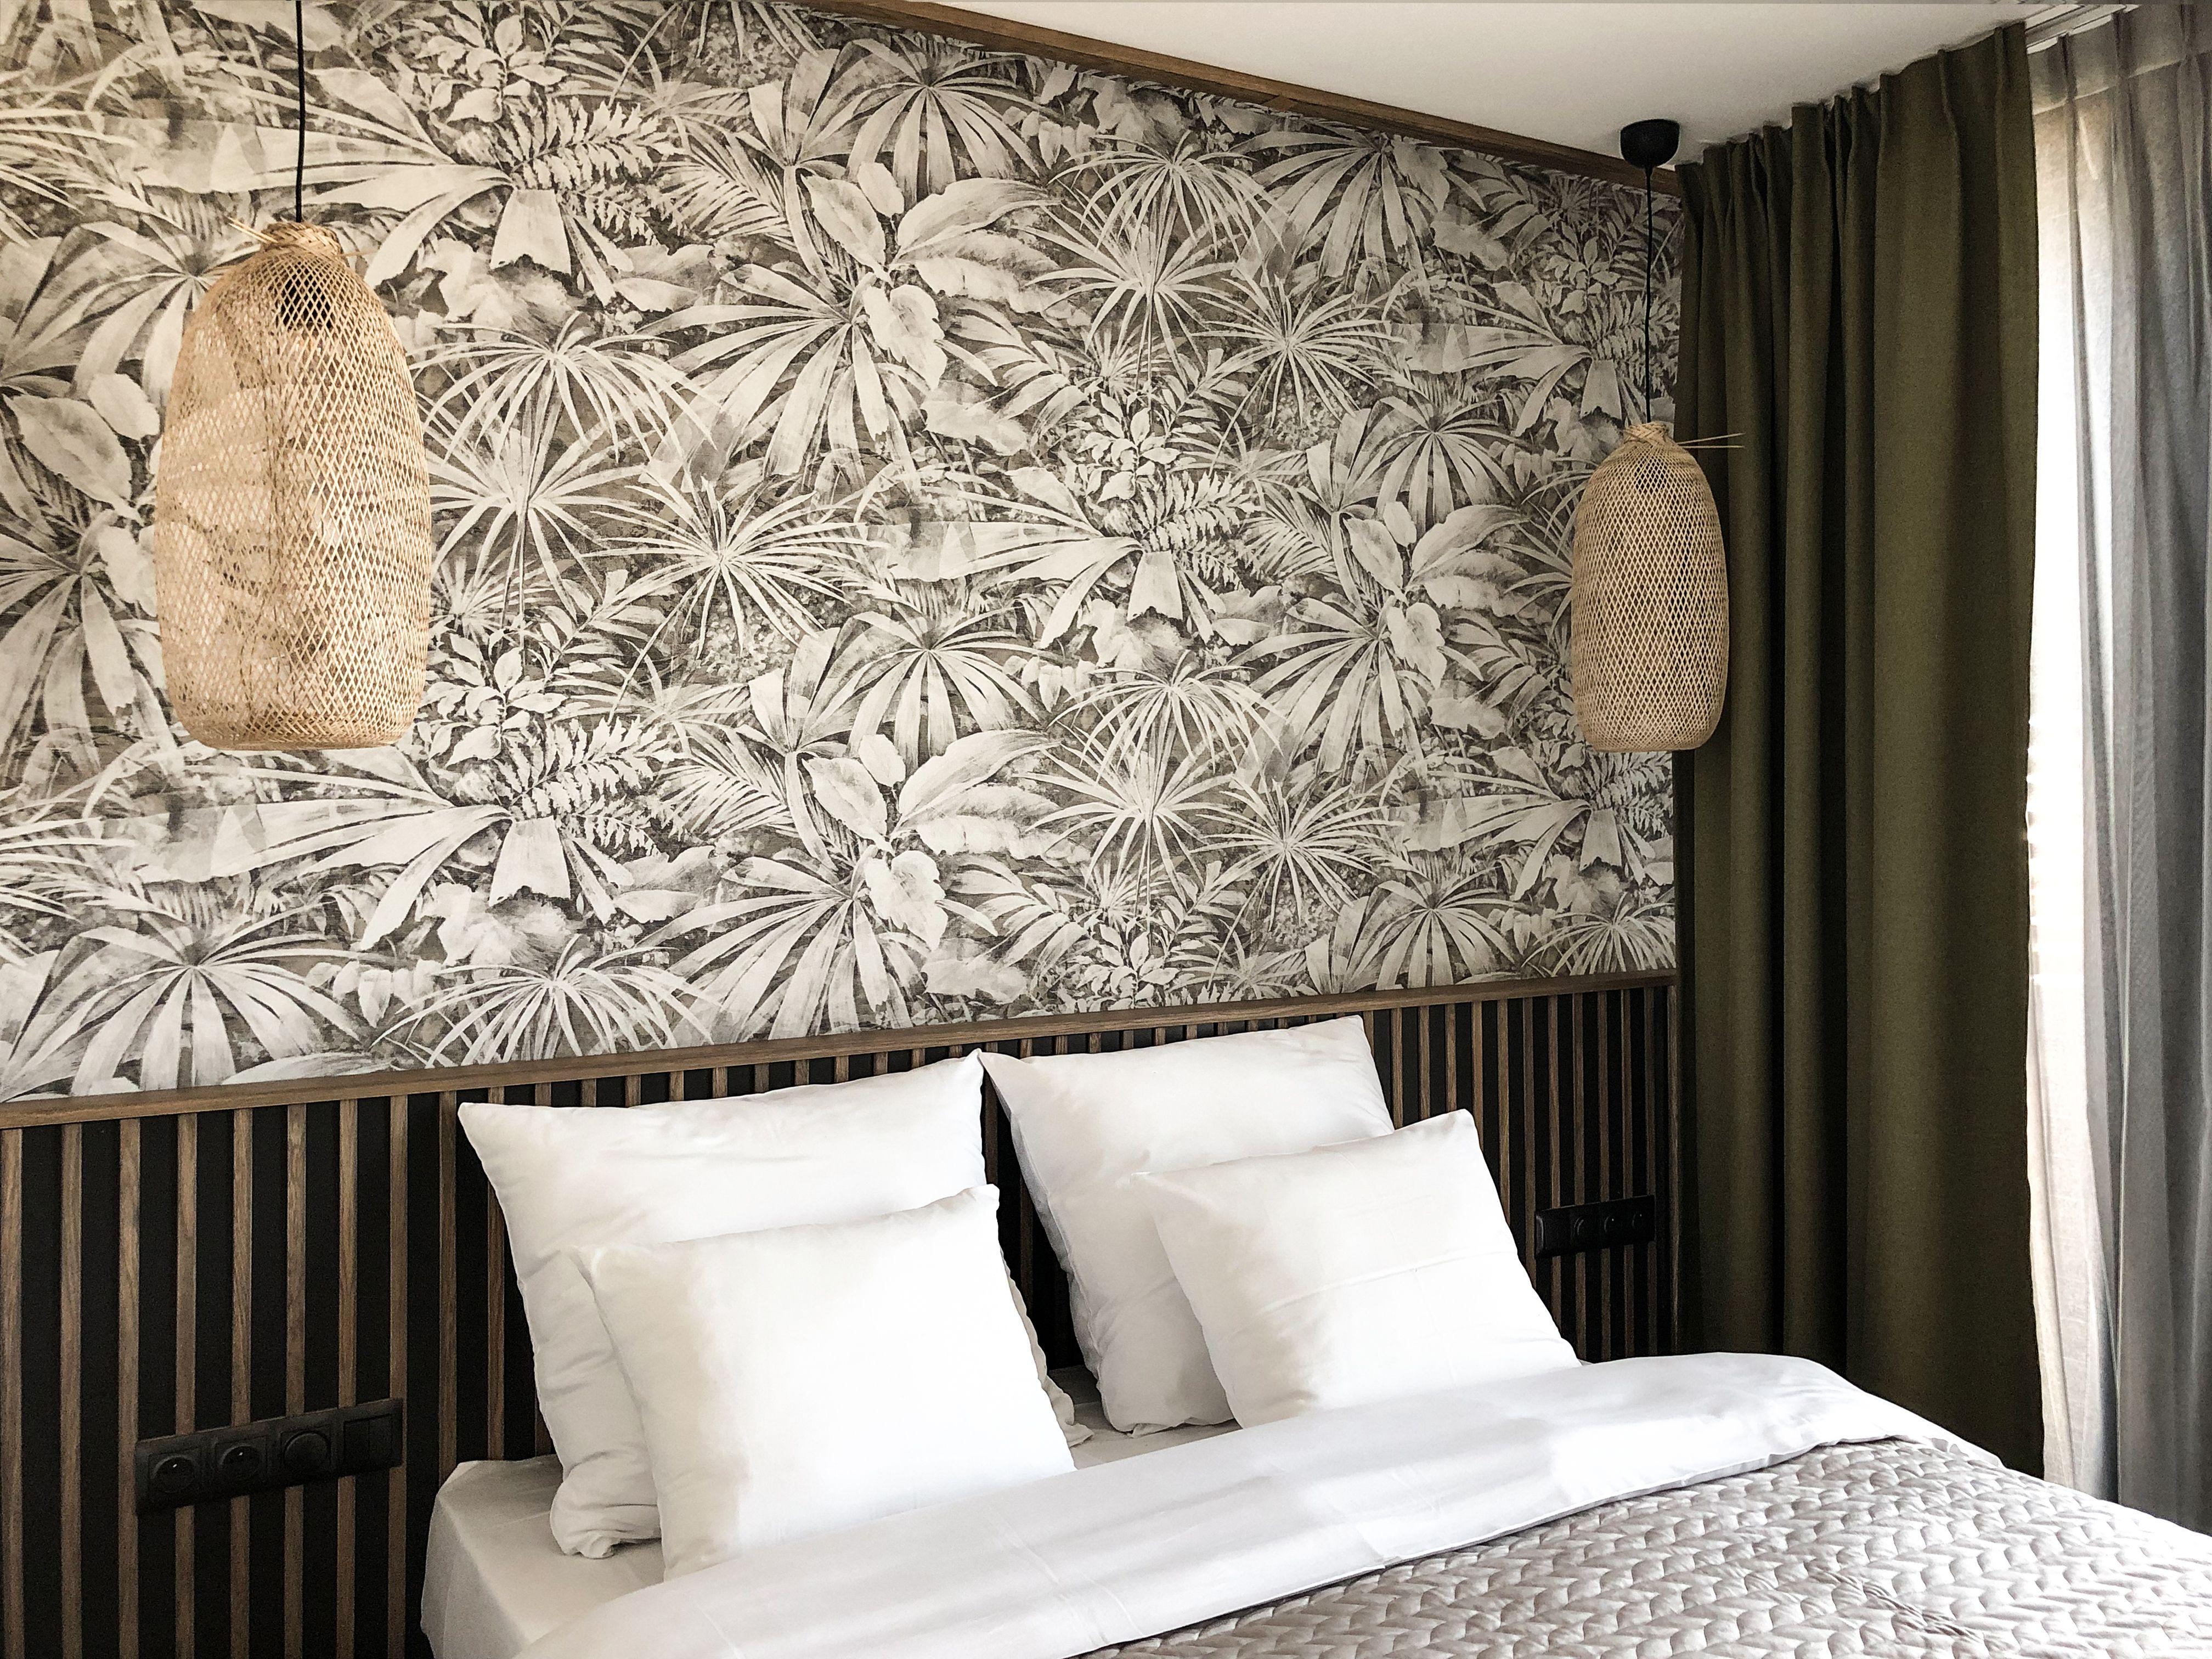 Best Bedroom Floral Wallpaper Bamboo Lamp Bed Headboard 400 x 300